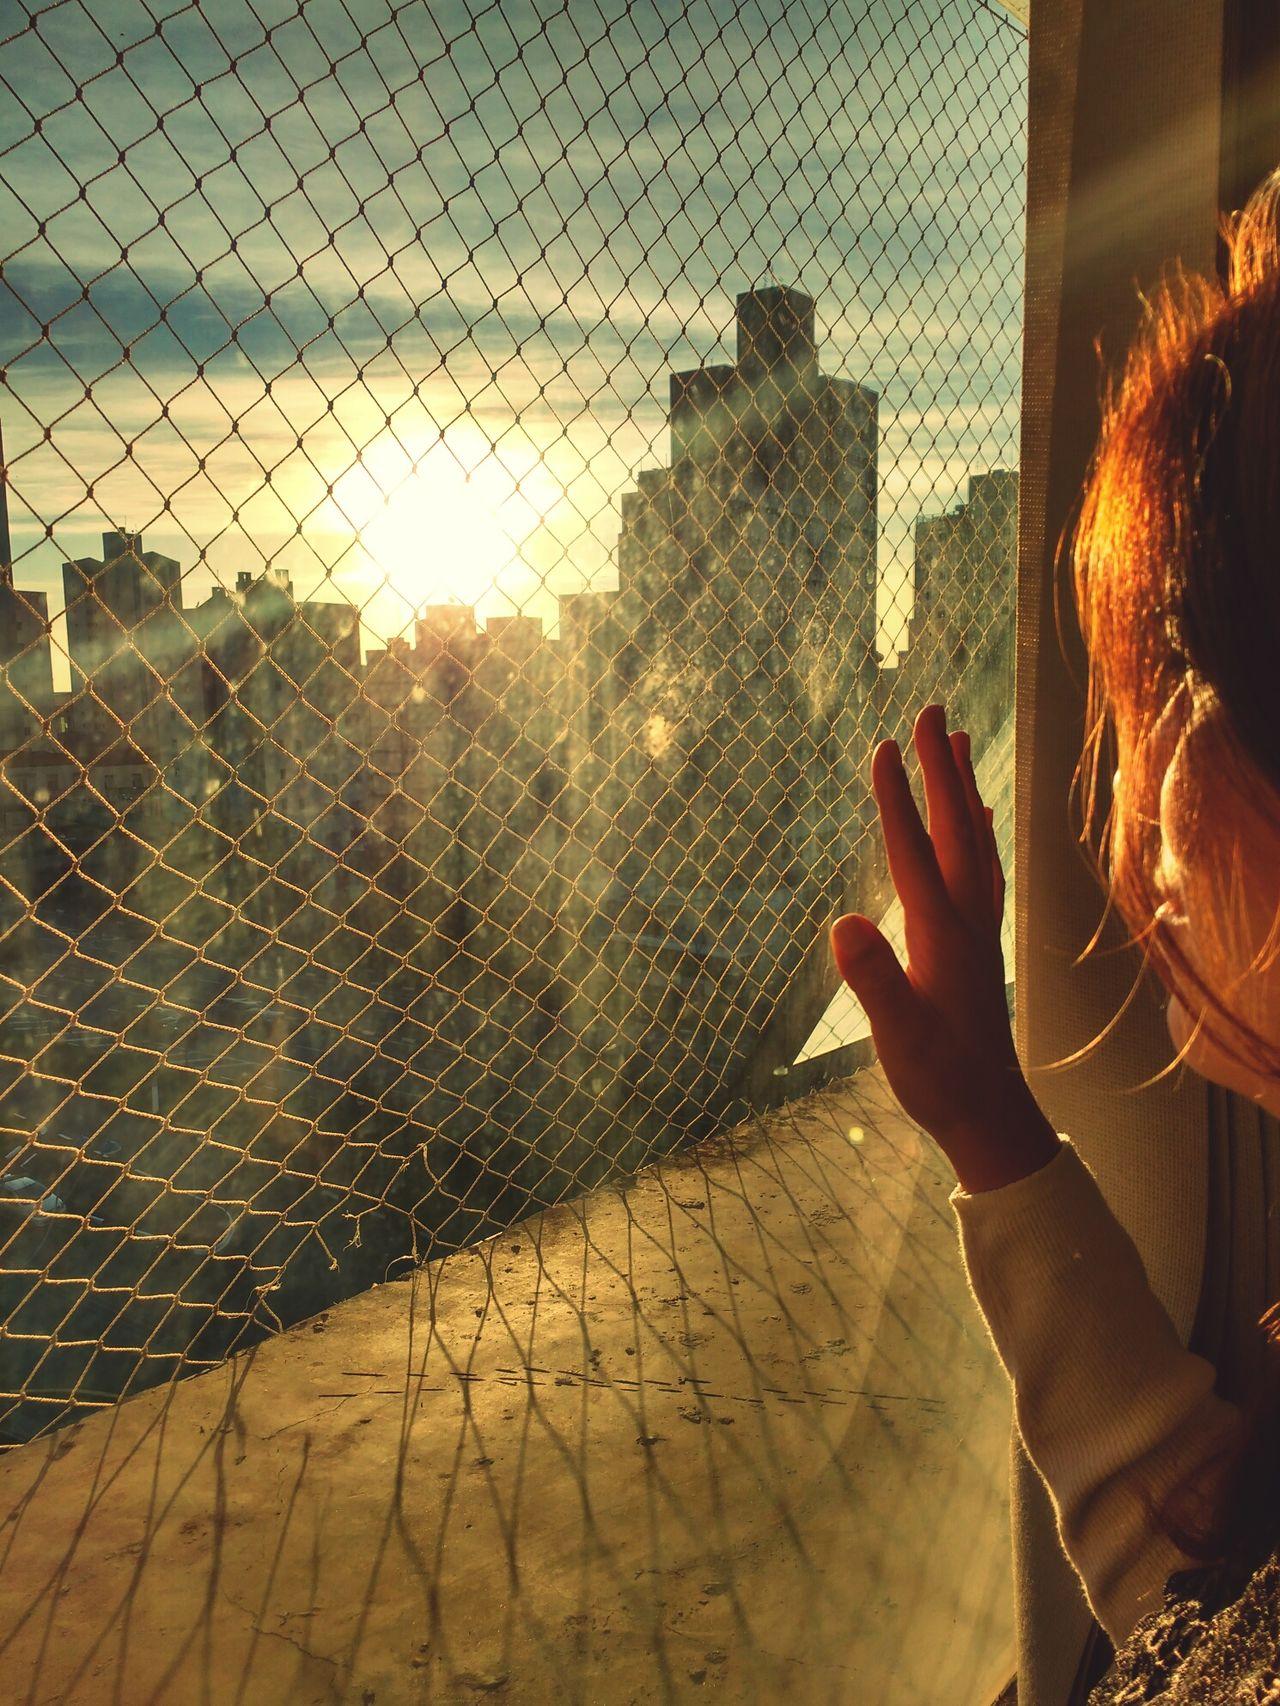 Watching the sunset... Me Work Workout Campinas, São Paulo, Brasil Orange Color Sun EyeEmNewHere Taking Pictures Taking Photos Watching The Sunset Sunset Buildings Urban Take With Smartphone Motog3 Selfportrait Selfie ✌ Selfie